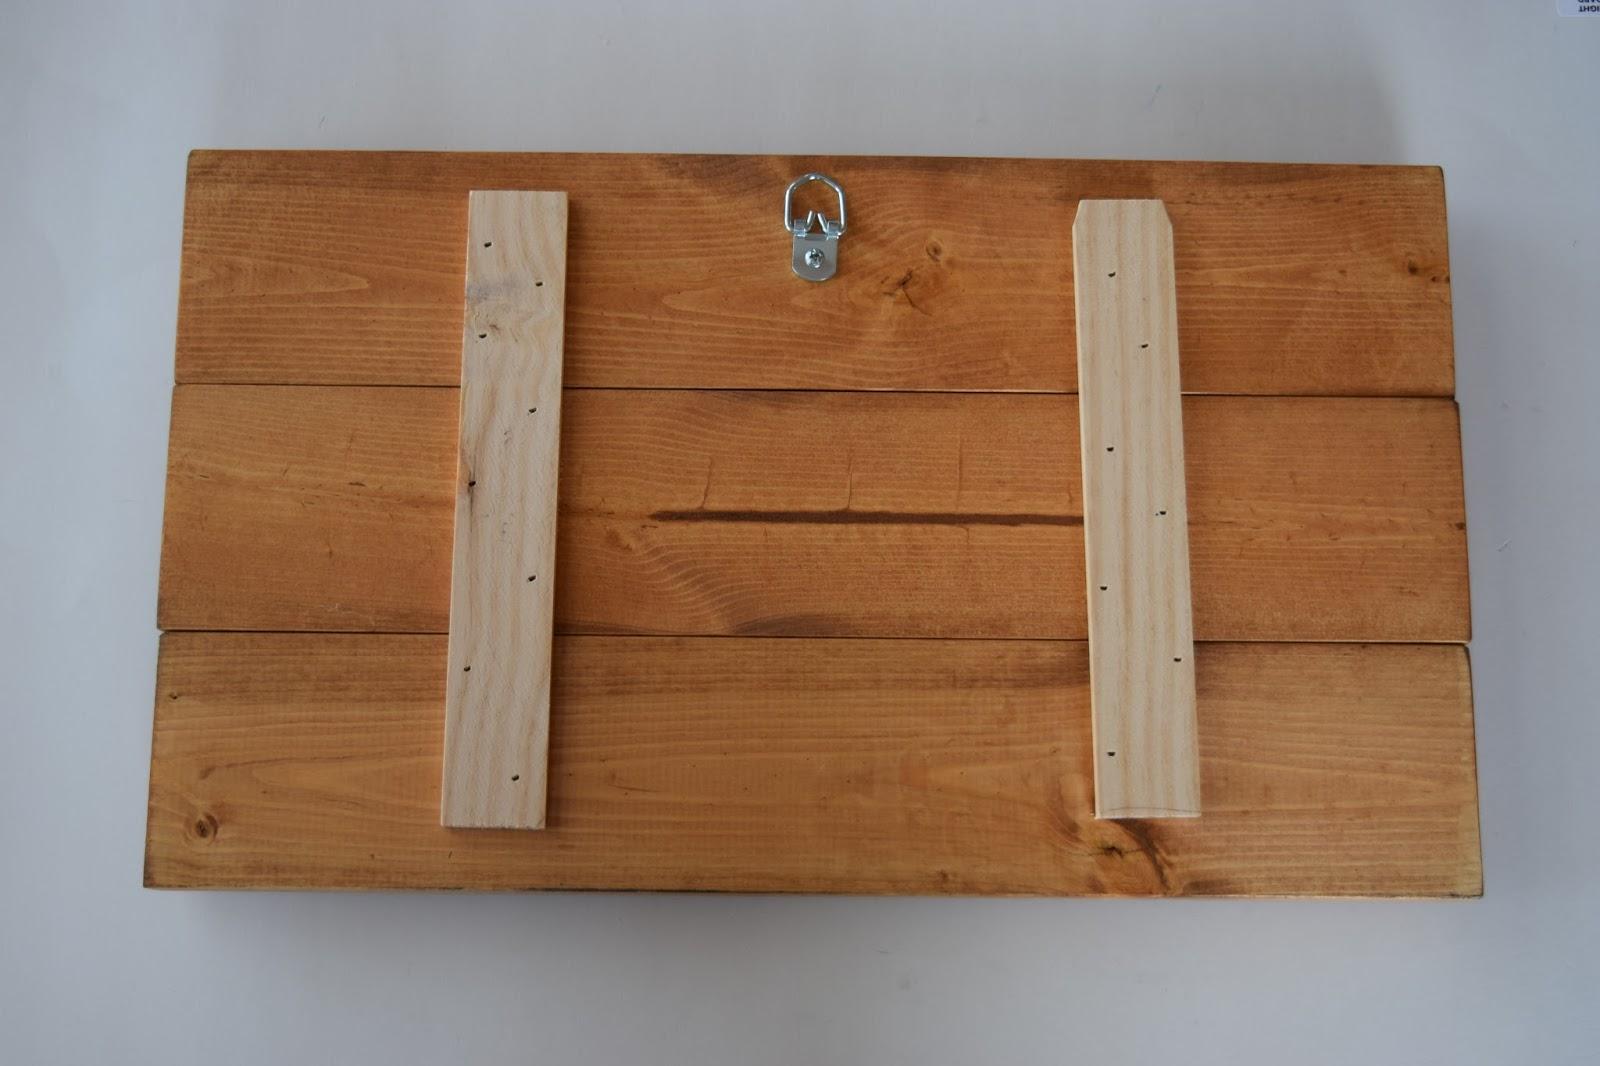 How to Make Karate Board Breaking Display